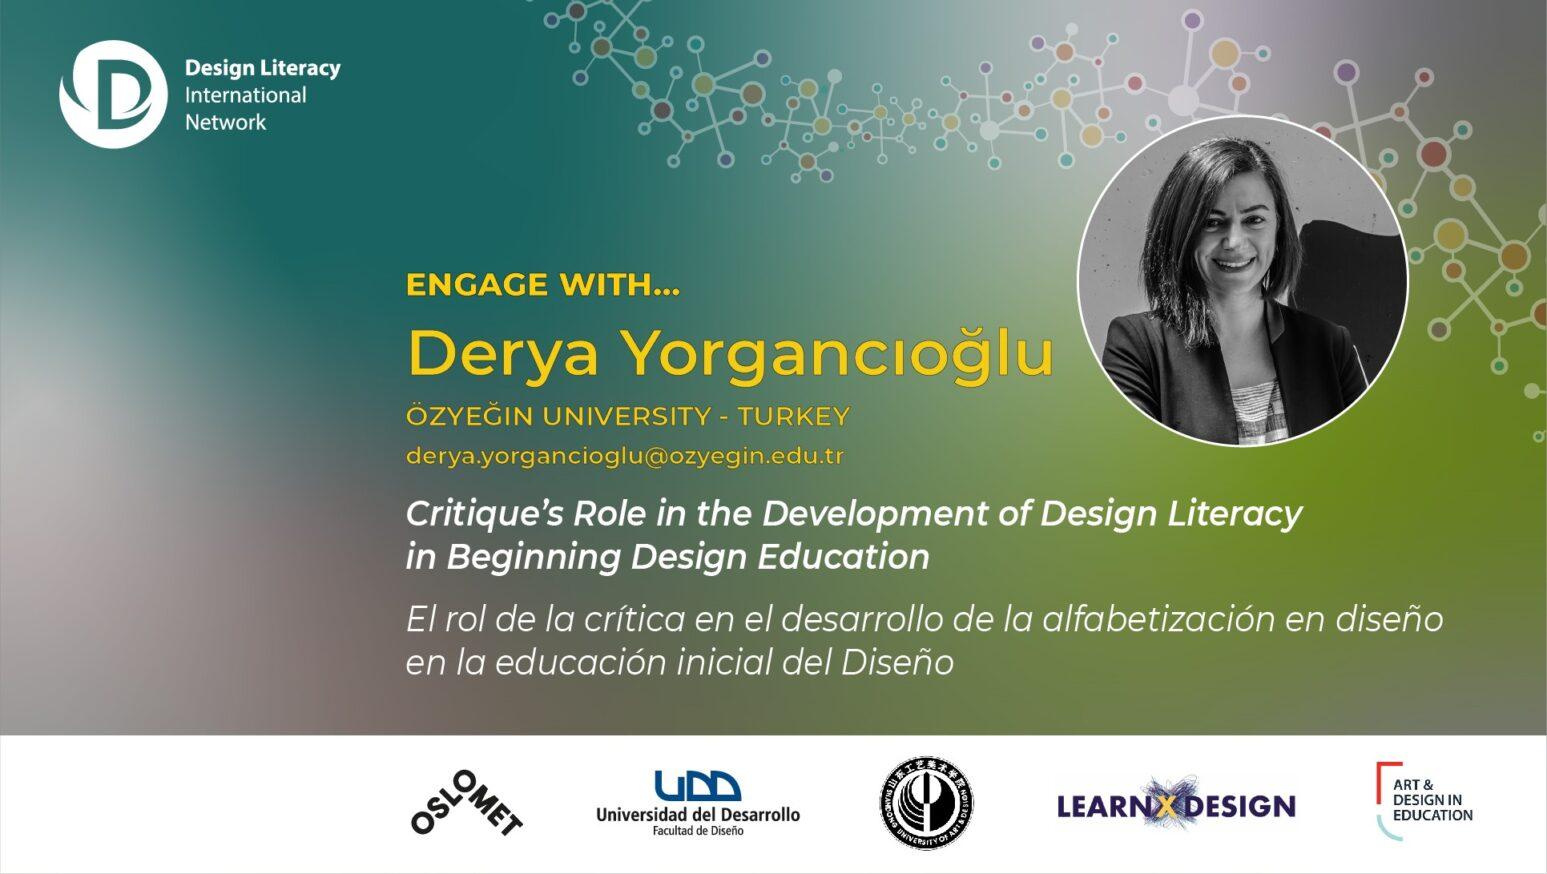 Engage with Derya Yorgancıoğlu